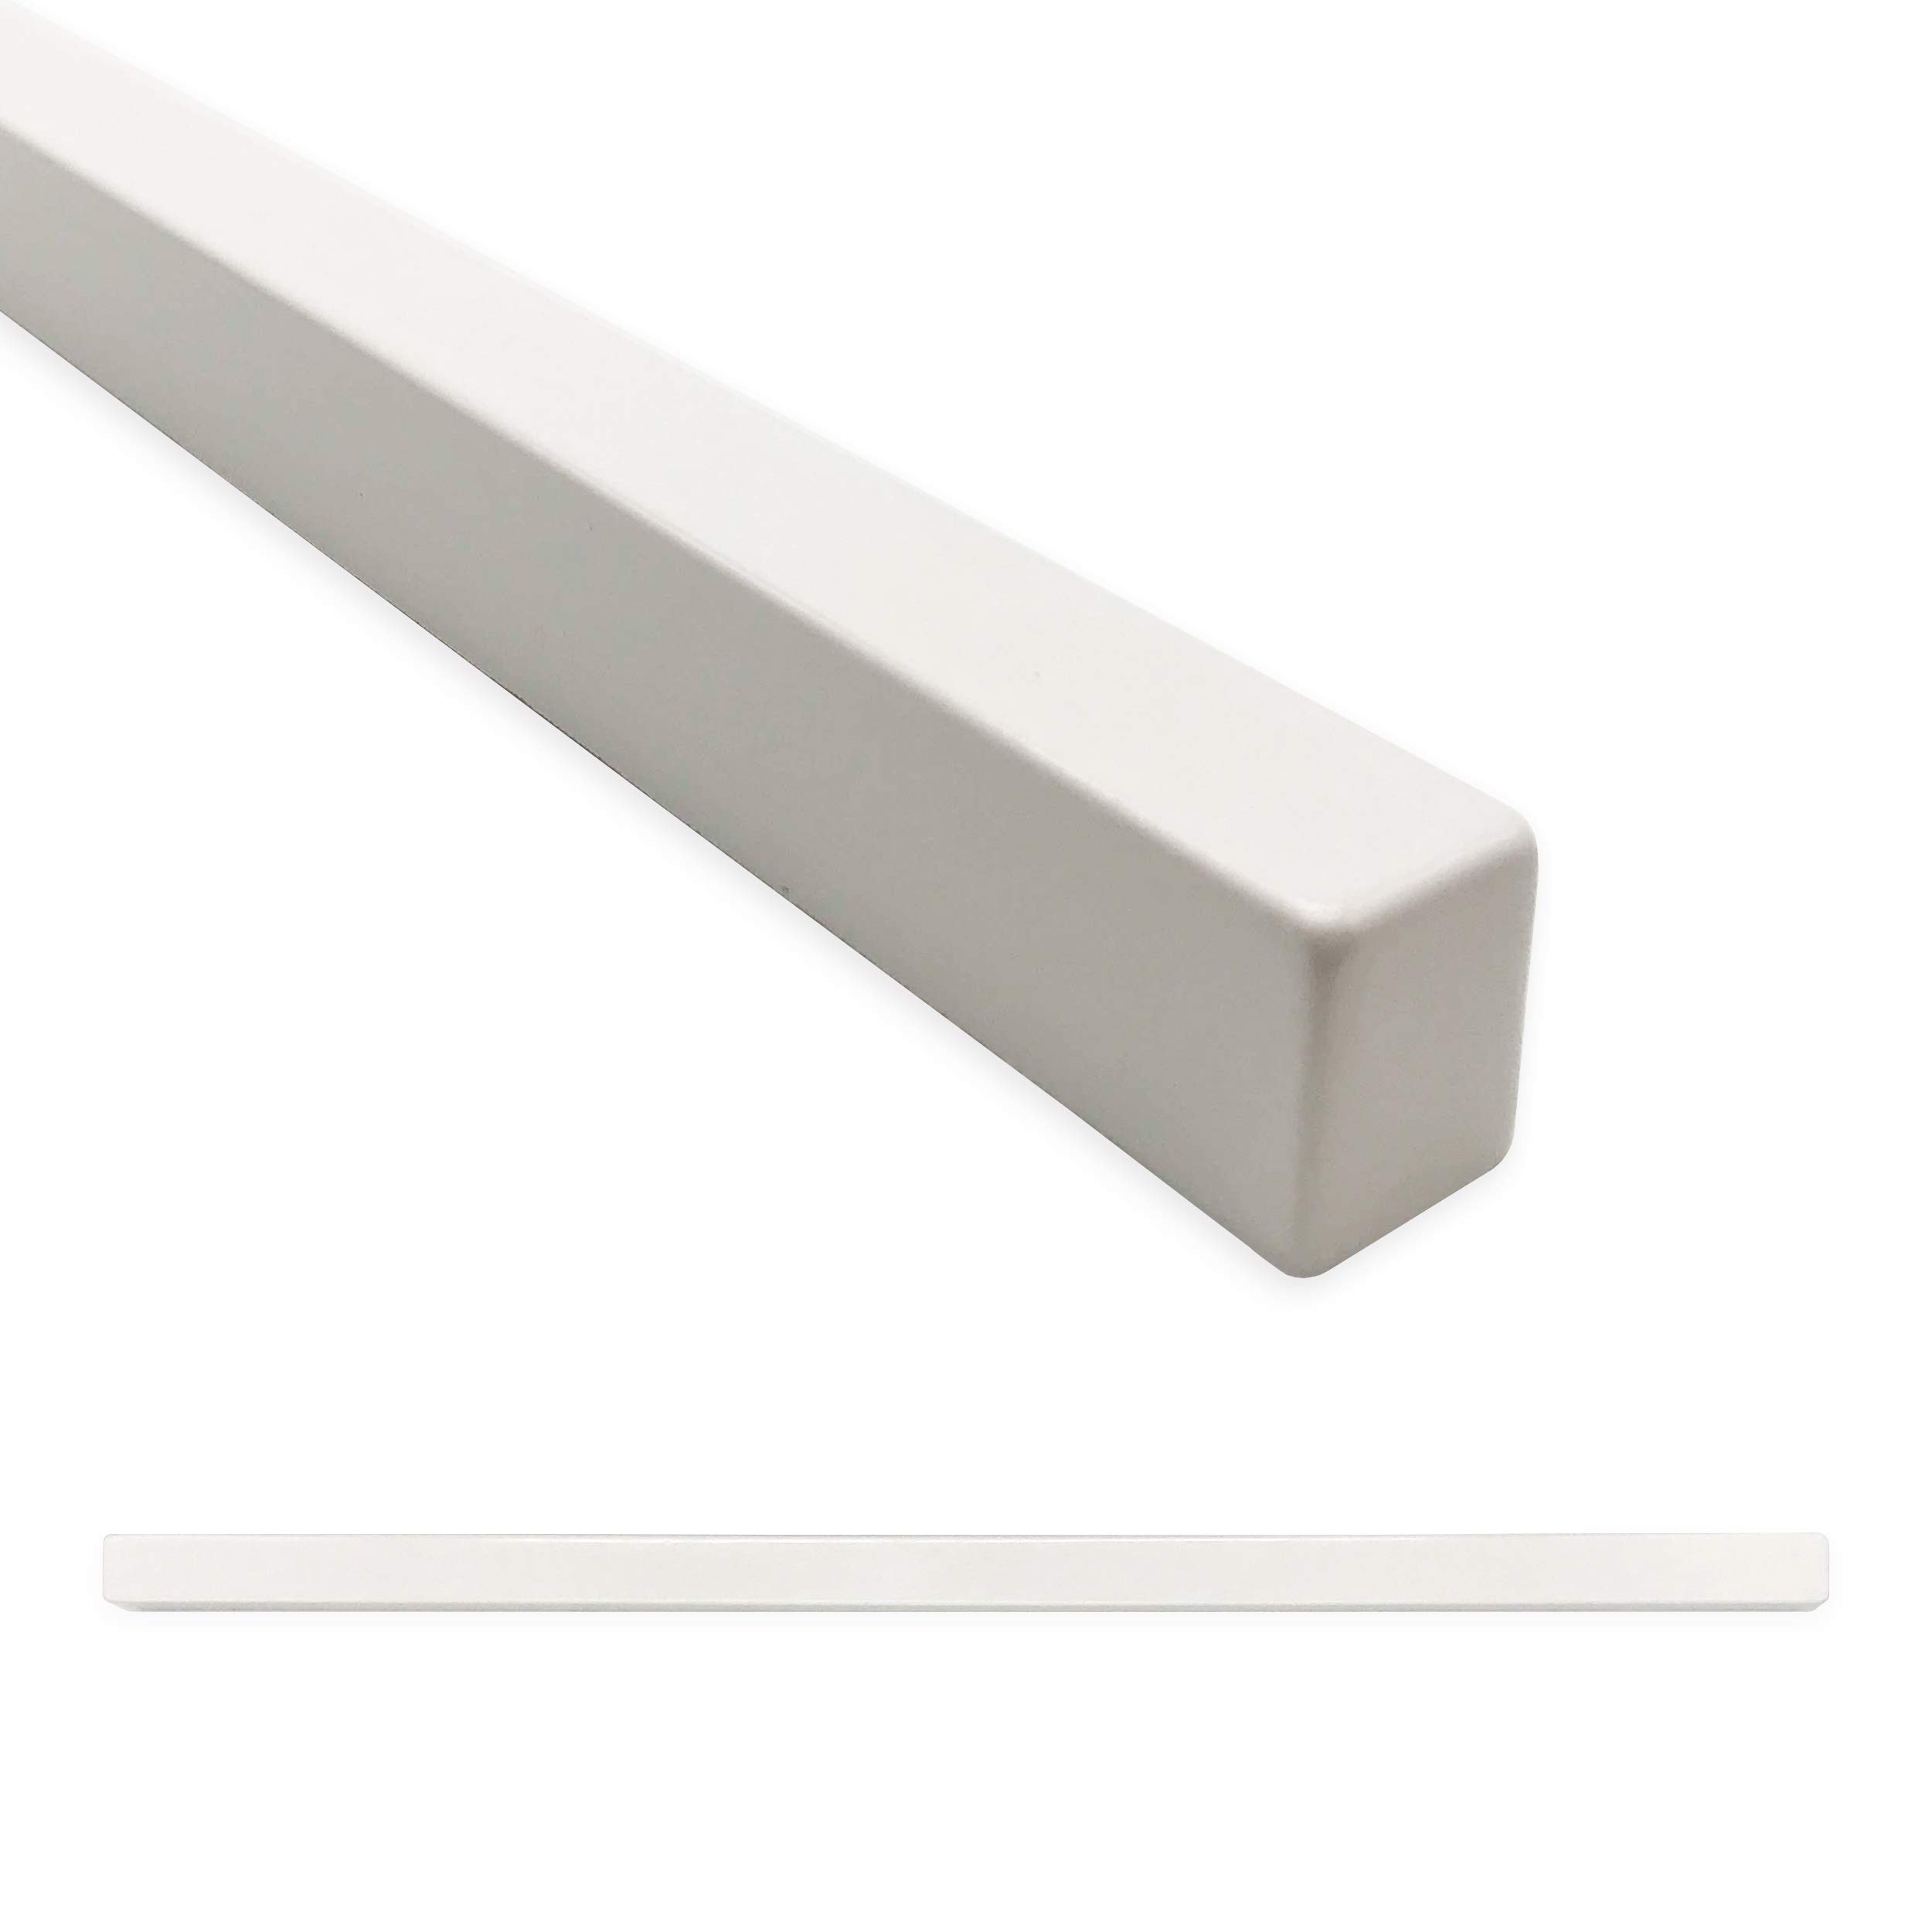 Square Tile Trim 1/2 x 12 inch Flat Pencil Decorative Shower Ceramic Tile Edge Backsplash Liner Wall Molding - Matte Bright White (6 Pack)